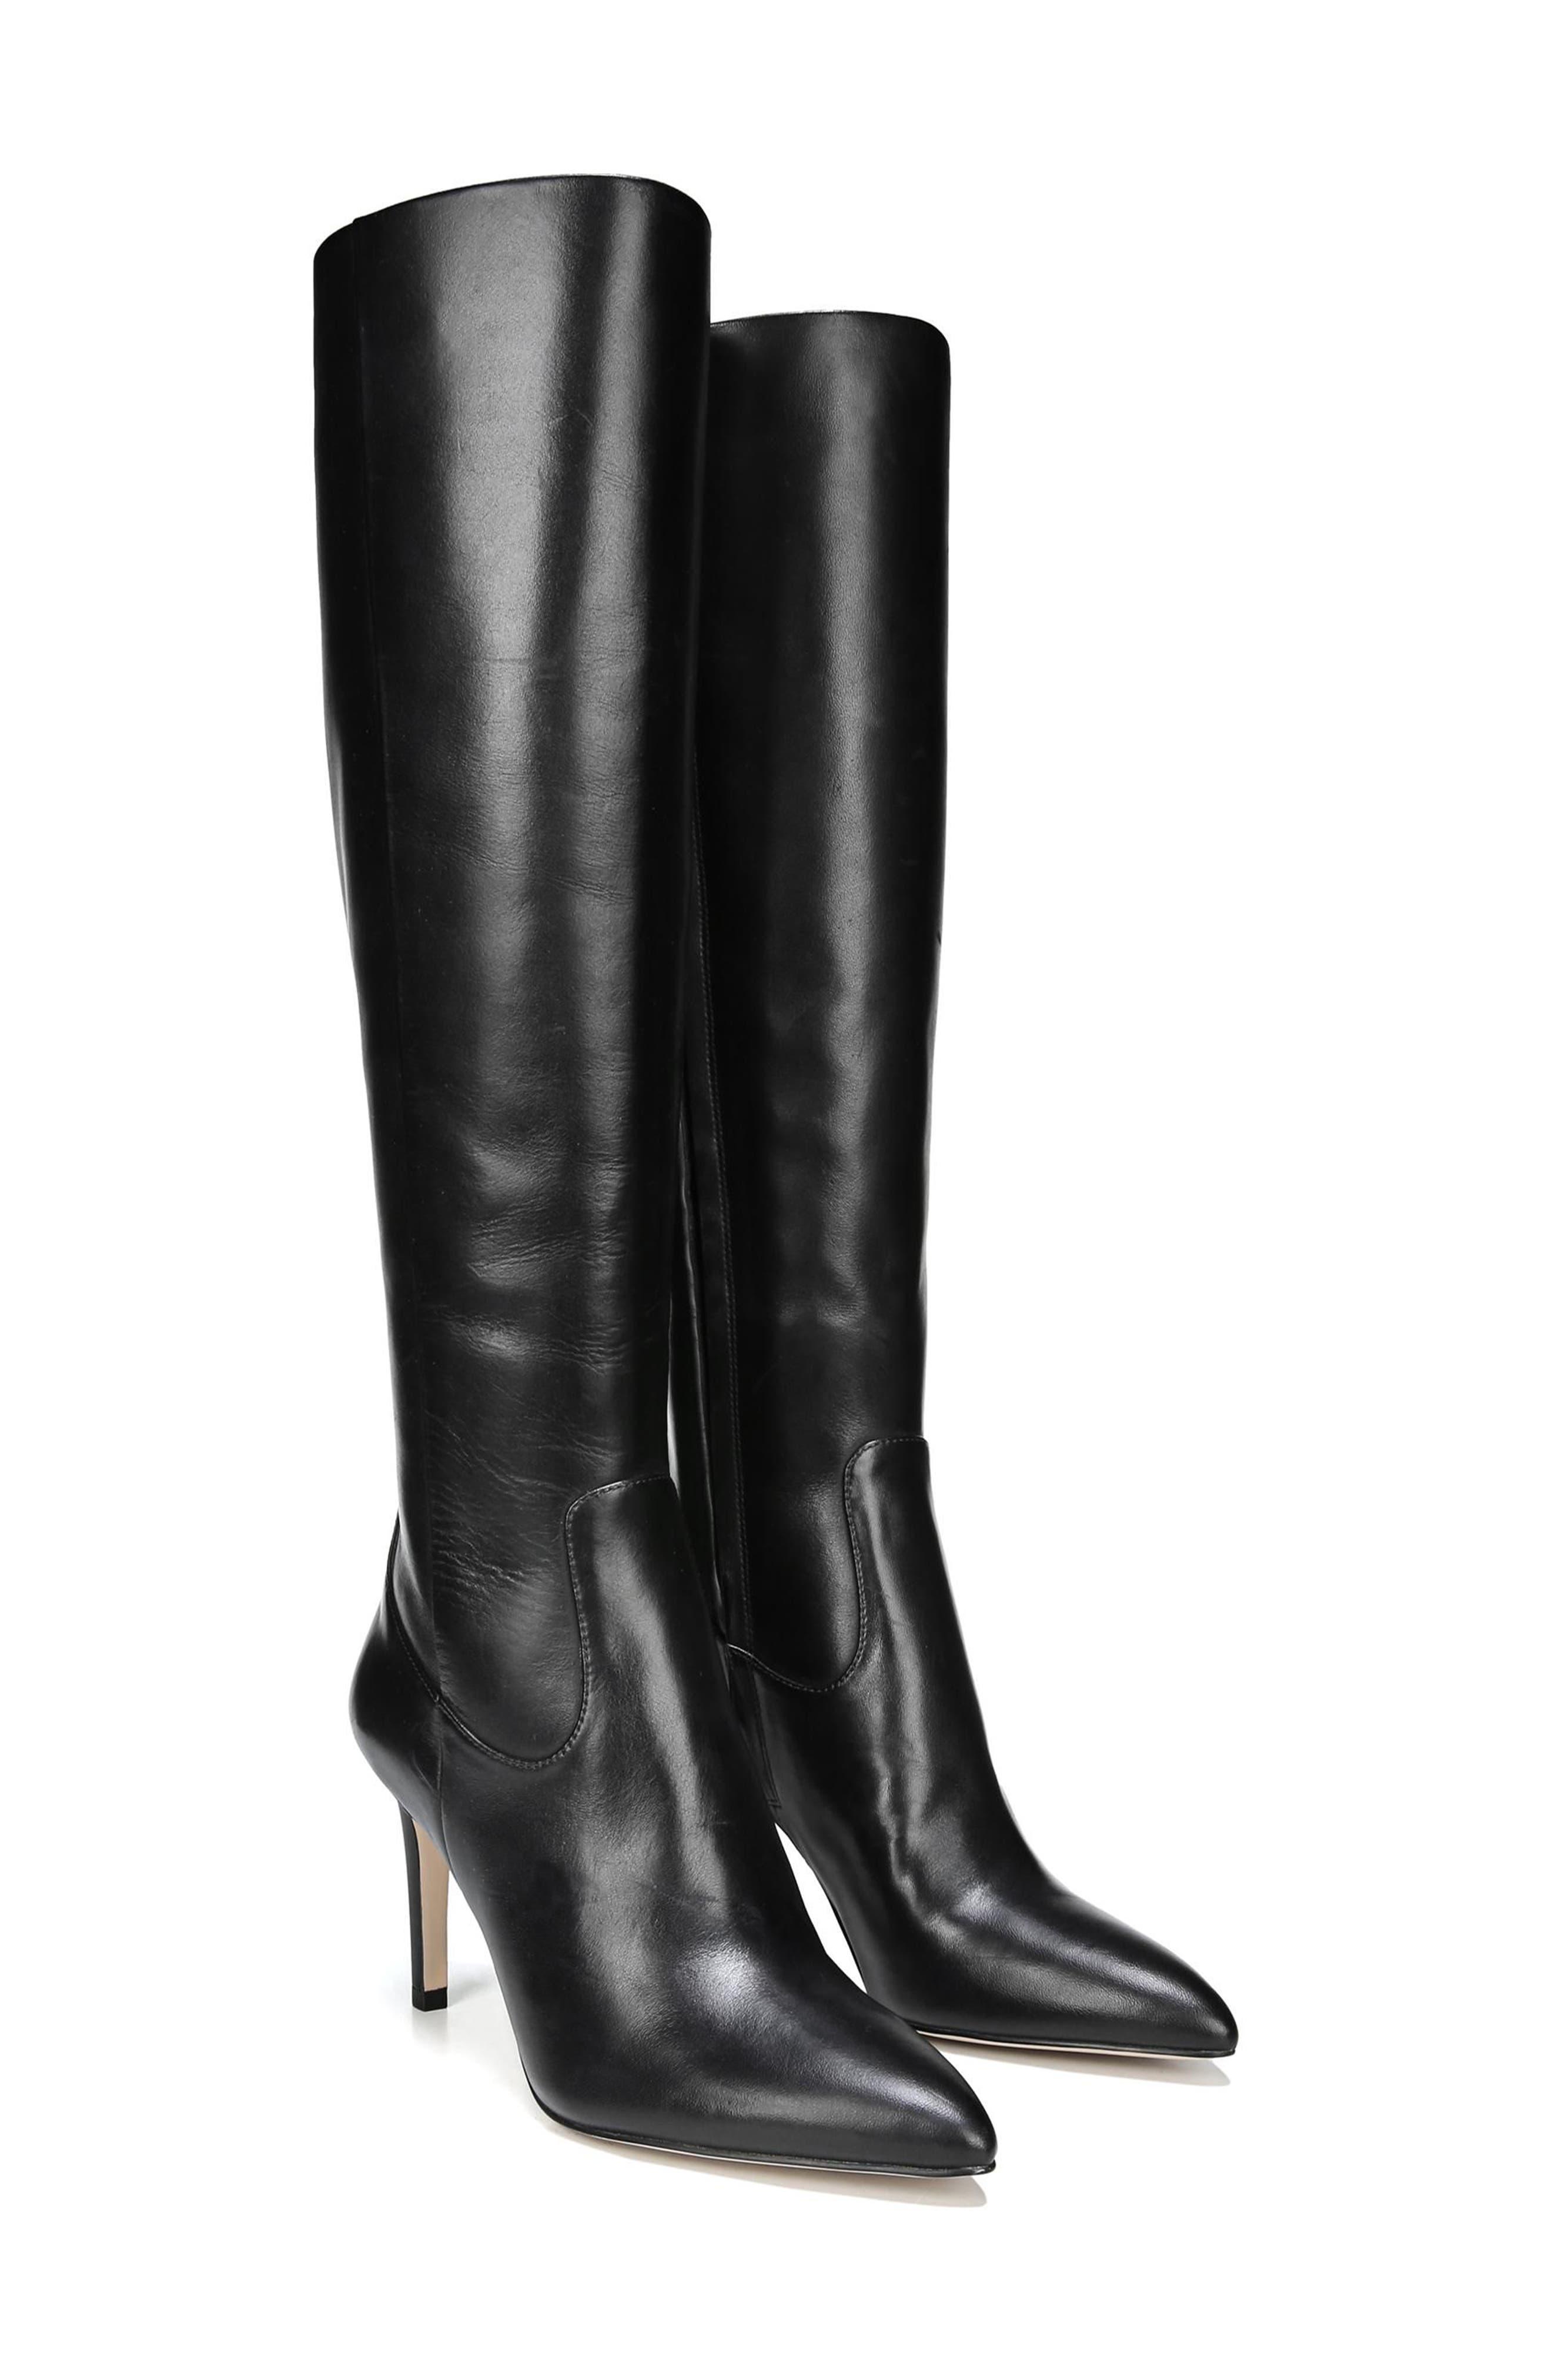 Olencia Knee High Boot,                             Alternate thumbnail 8, color,                             001